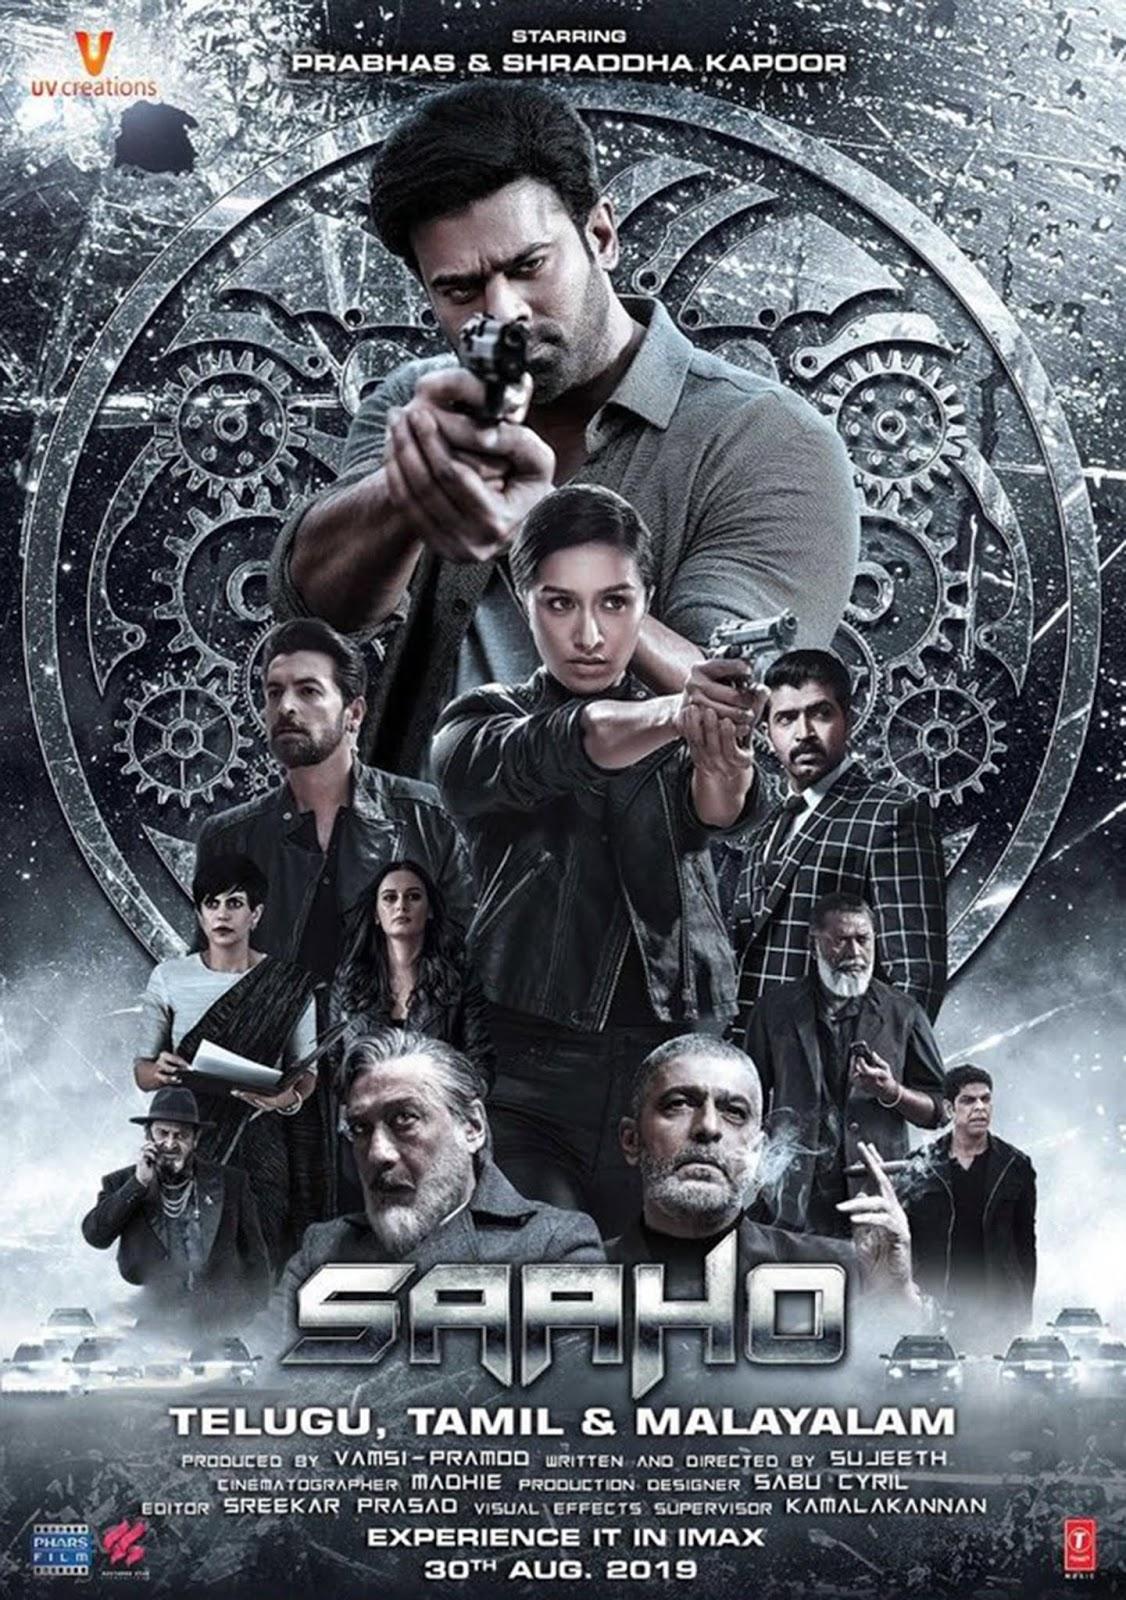 Saaho Full Movie Download Free Online In Hindi 2019 720p